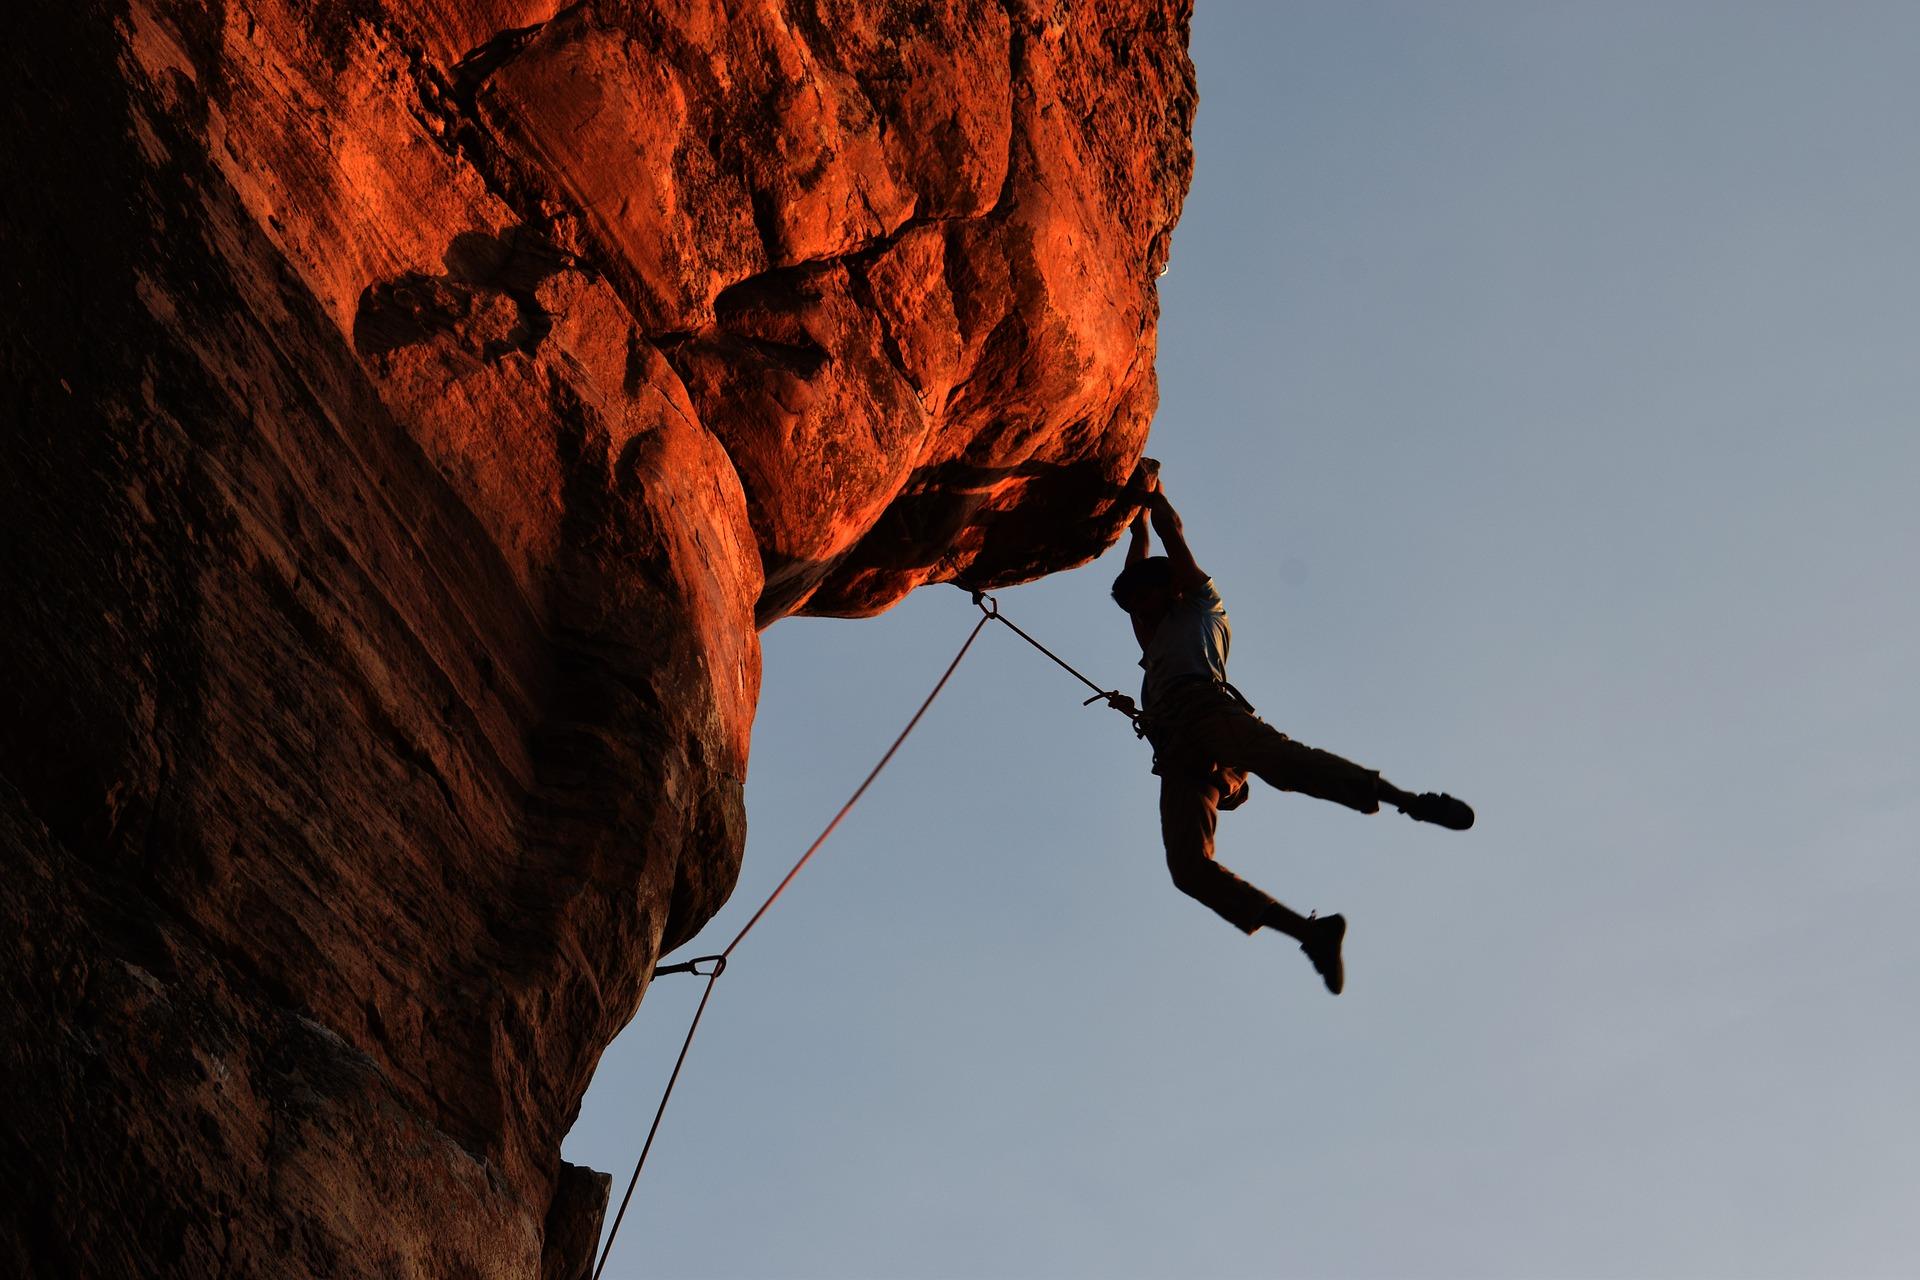 climbing-2264698_1920.jpg